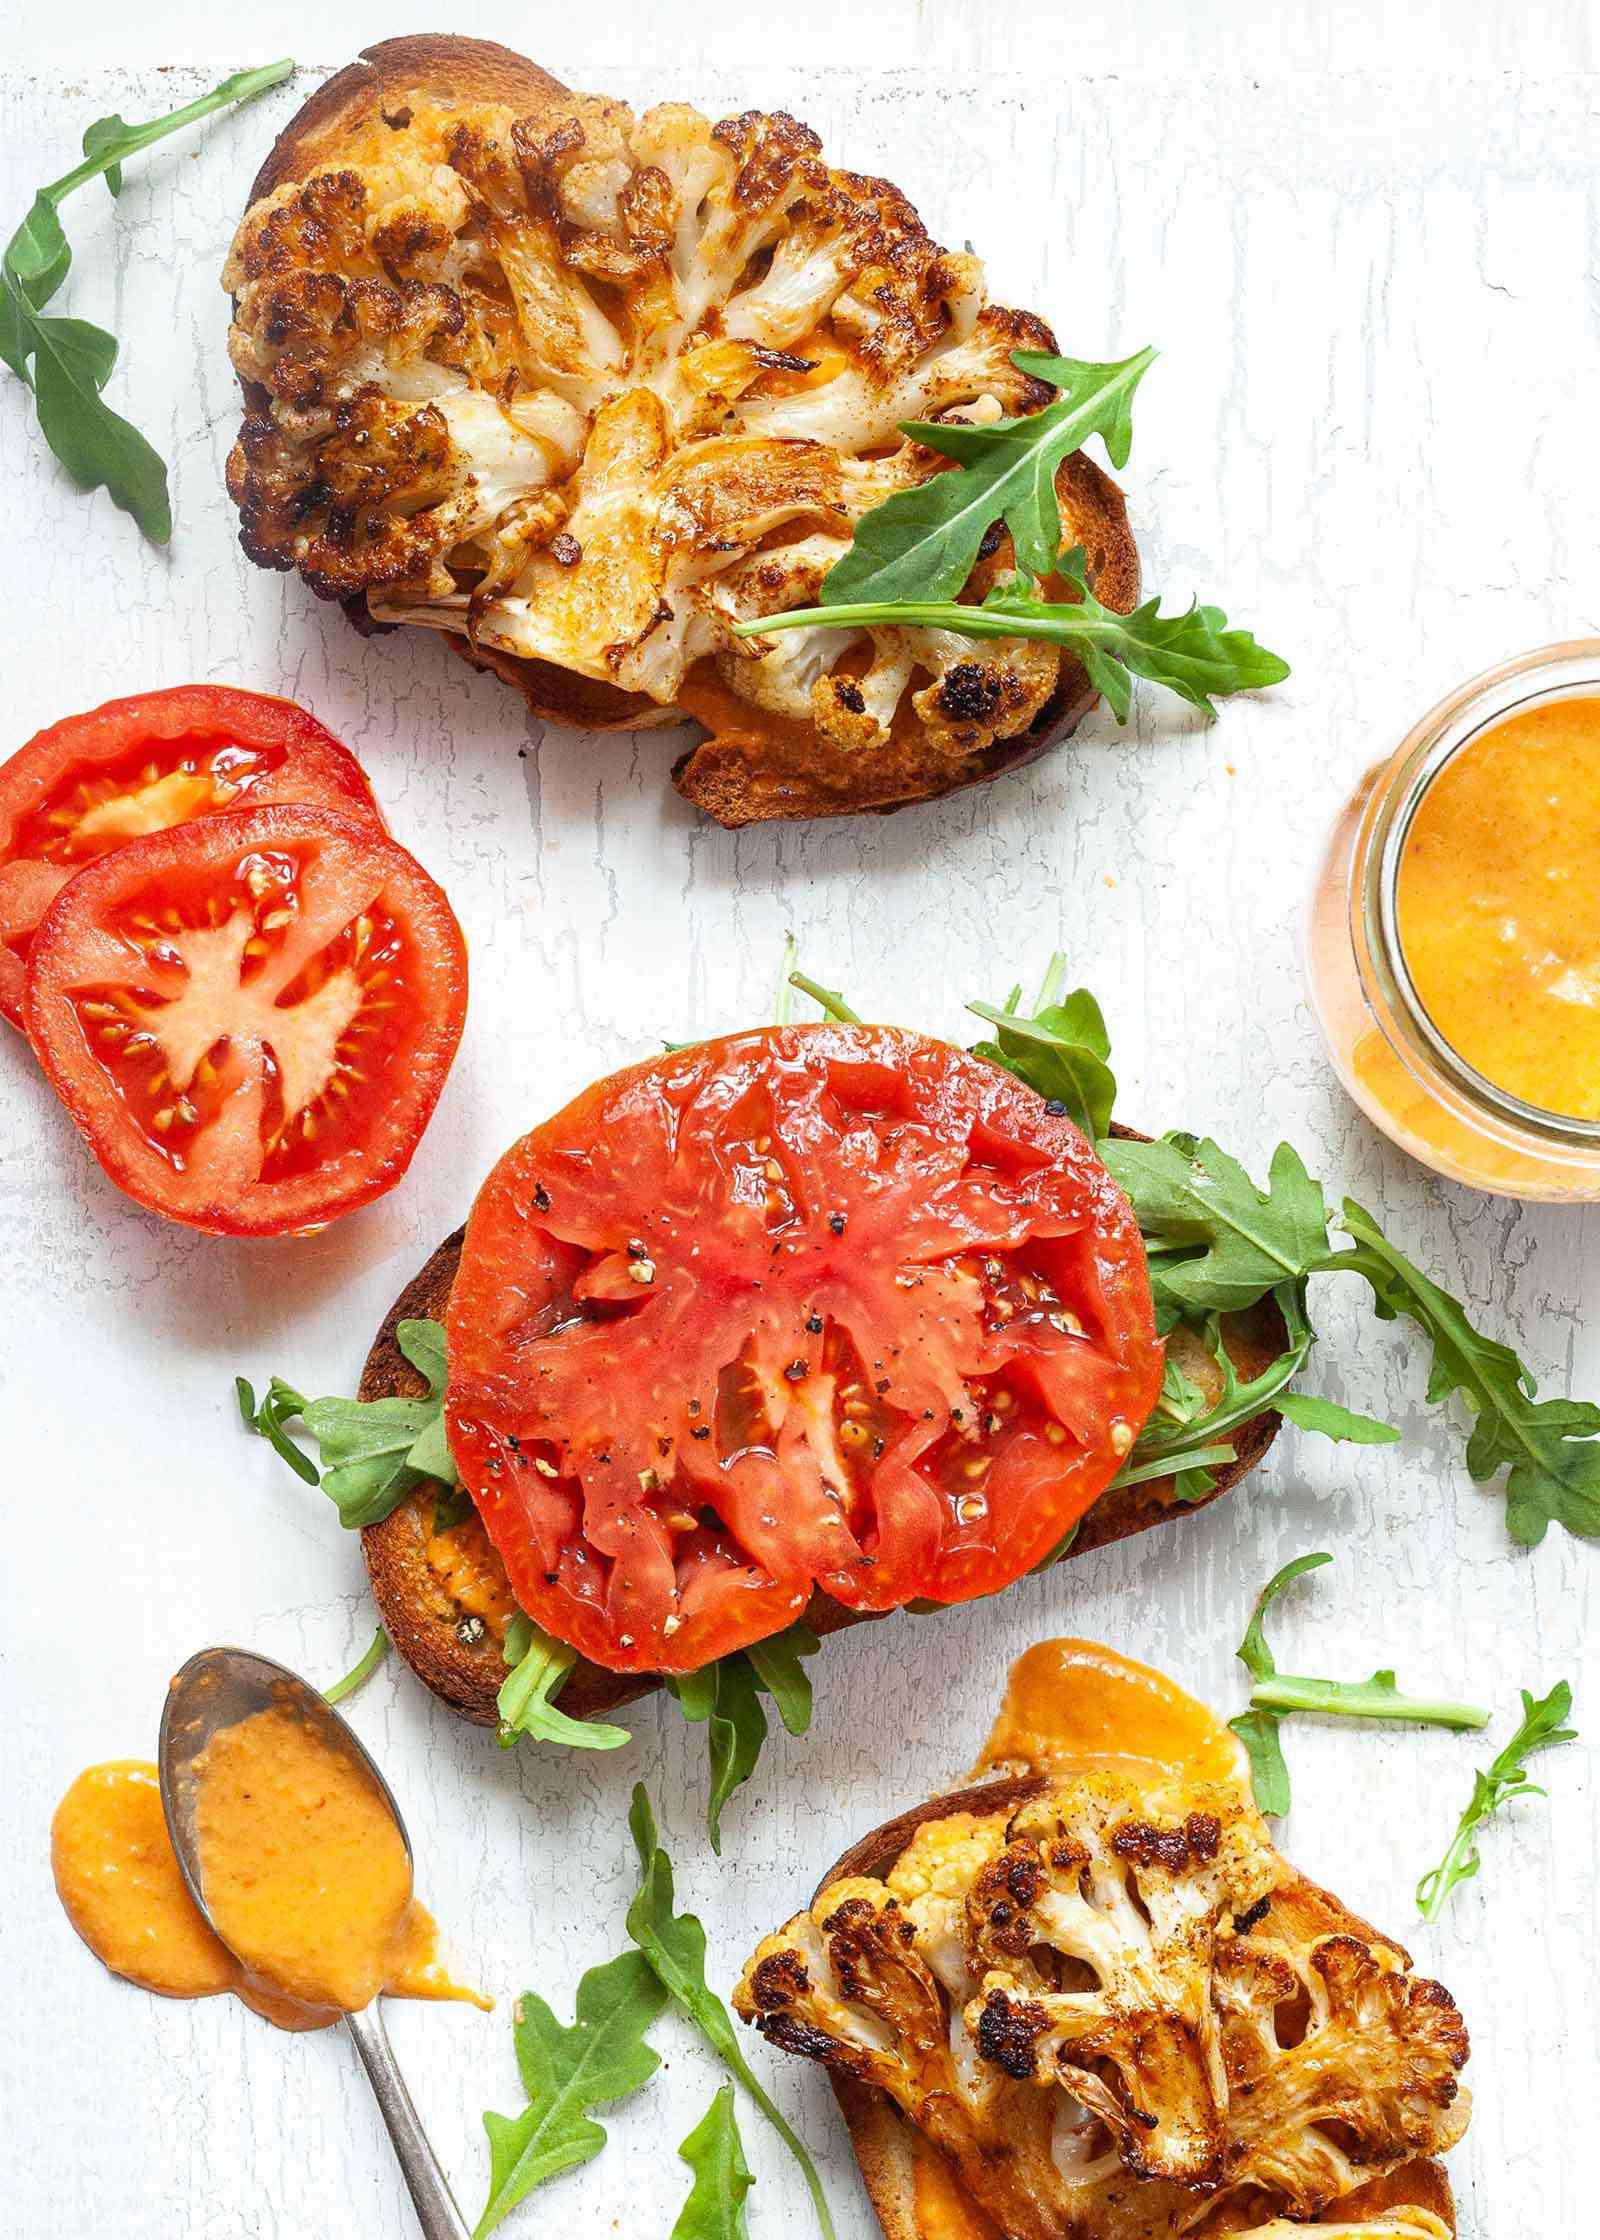 Easy Cauliflower Steak Sandwich - open faced sandwich with sliced tomatos, crusty sourdough bread and red pepper aioli